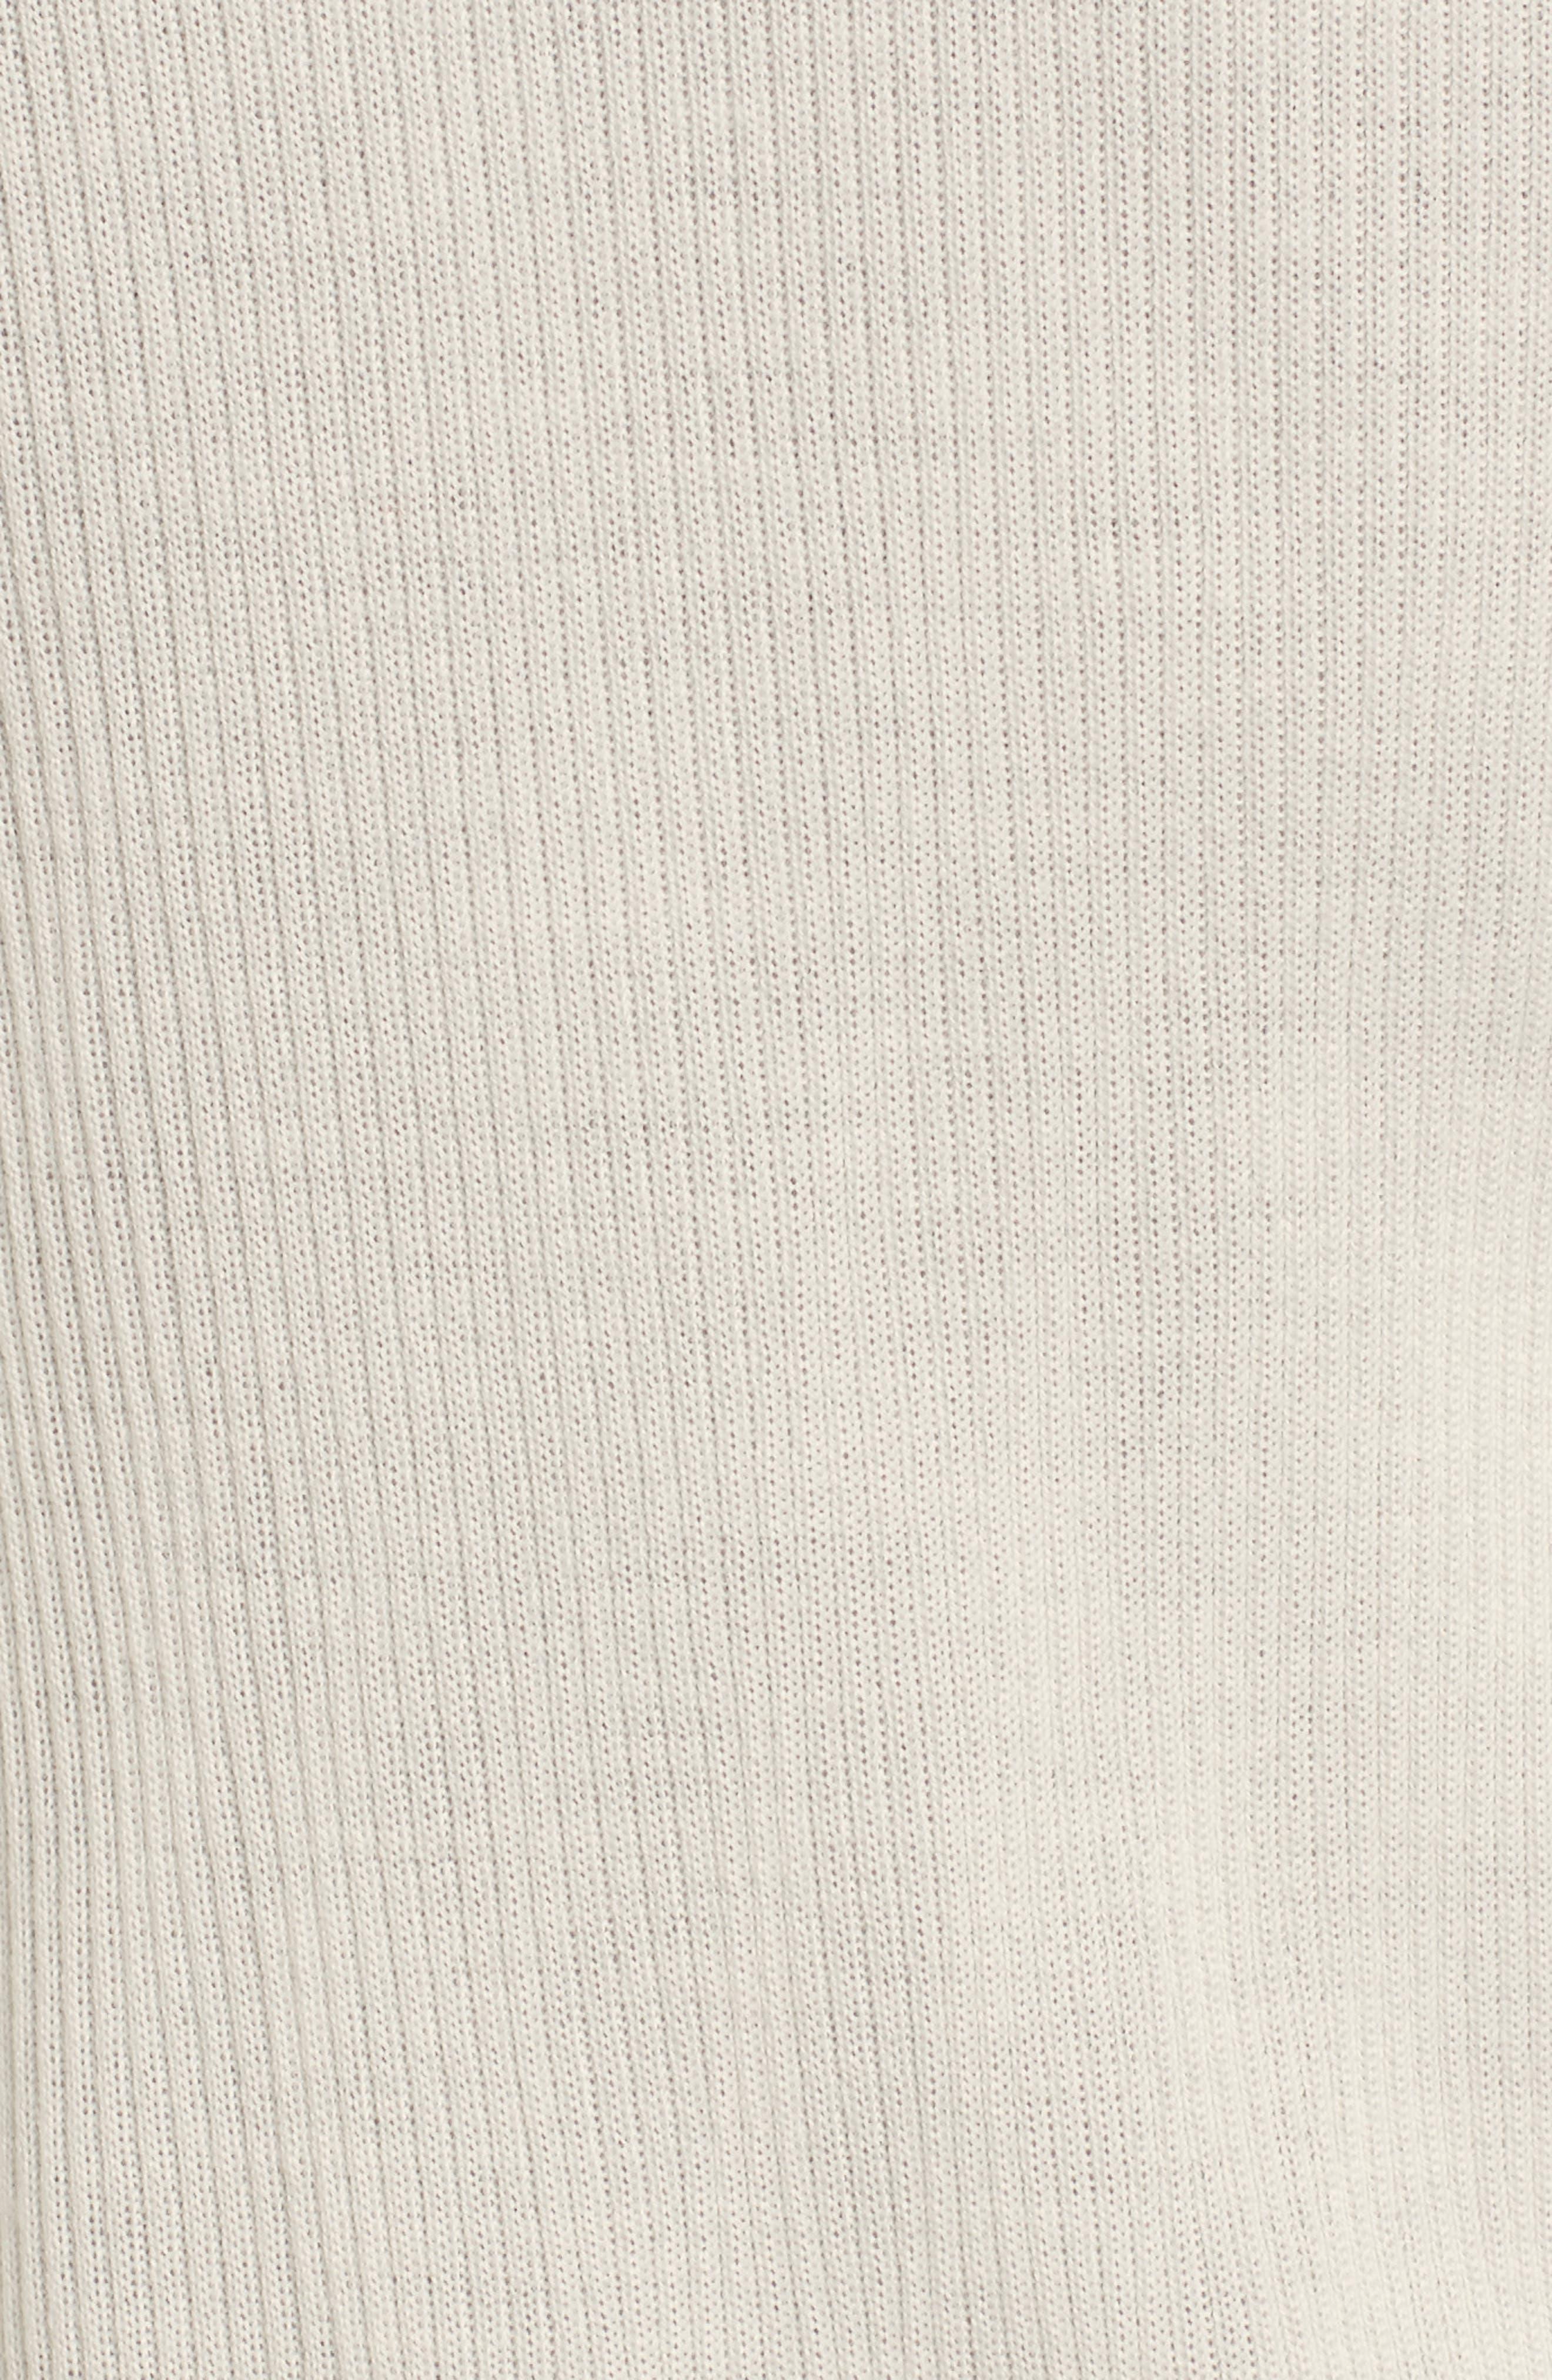 Rib Knit Wool Blend Cardigan,                             Alternate thumbnail 99, color,